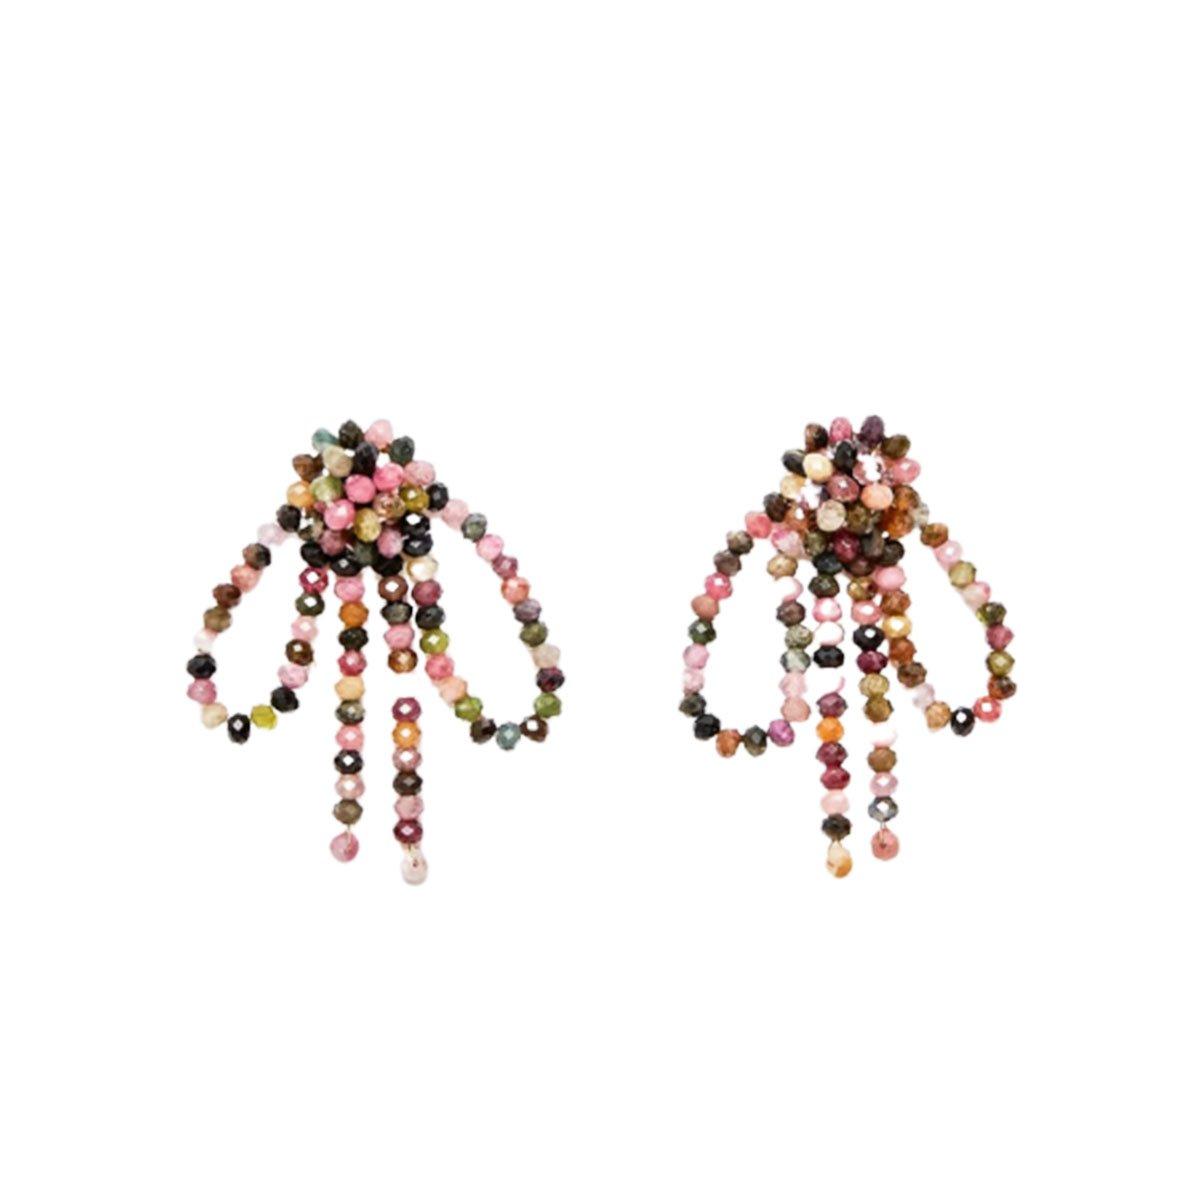 Beaded Bow earrings